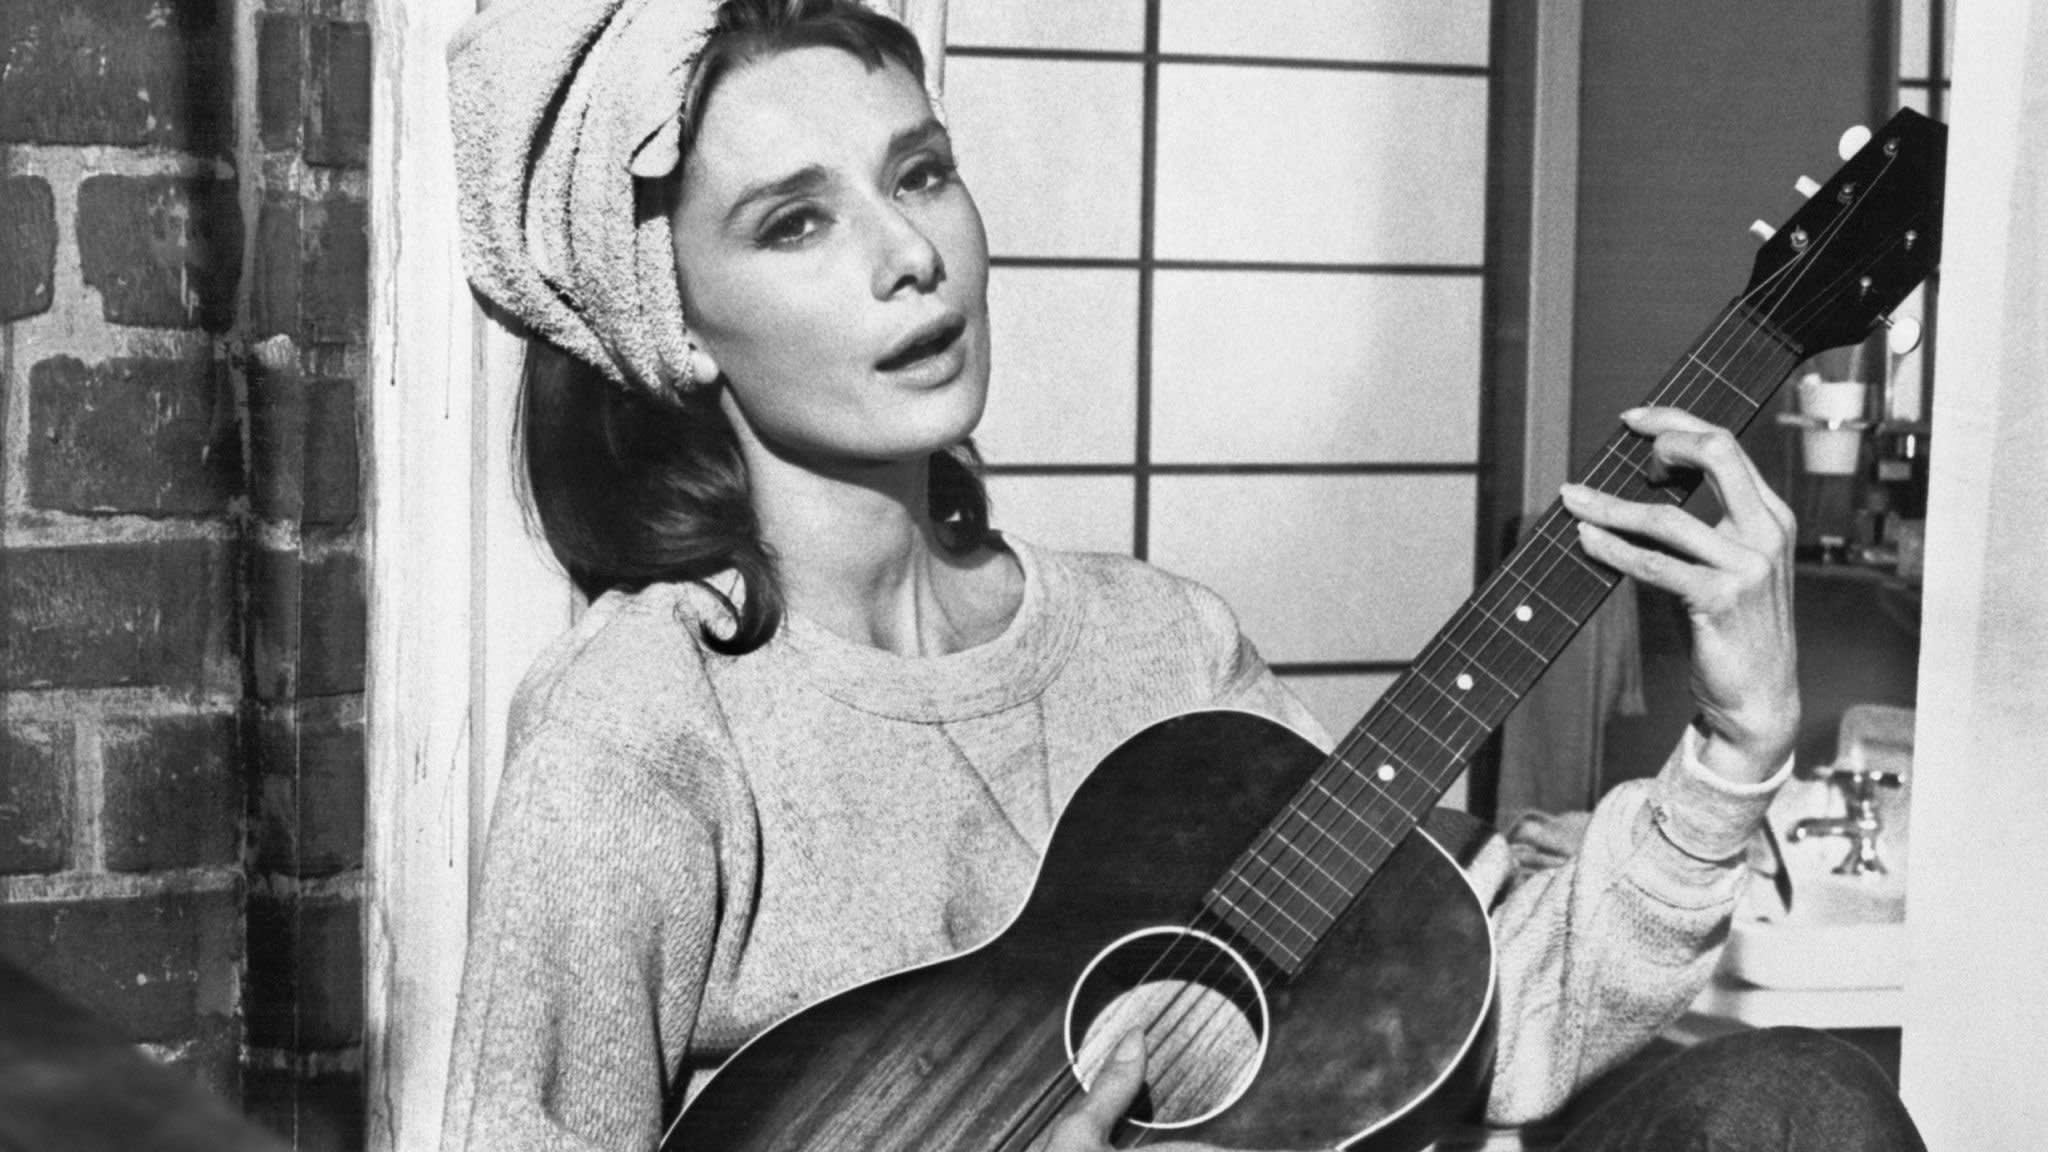 Audrey Hepburn singing Moon River in Breakfast at Tiffany's